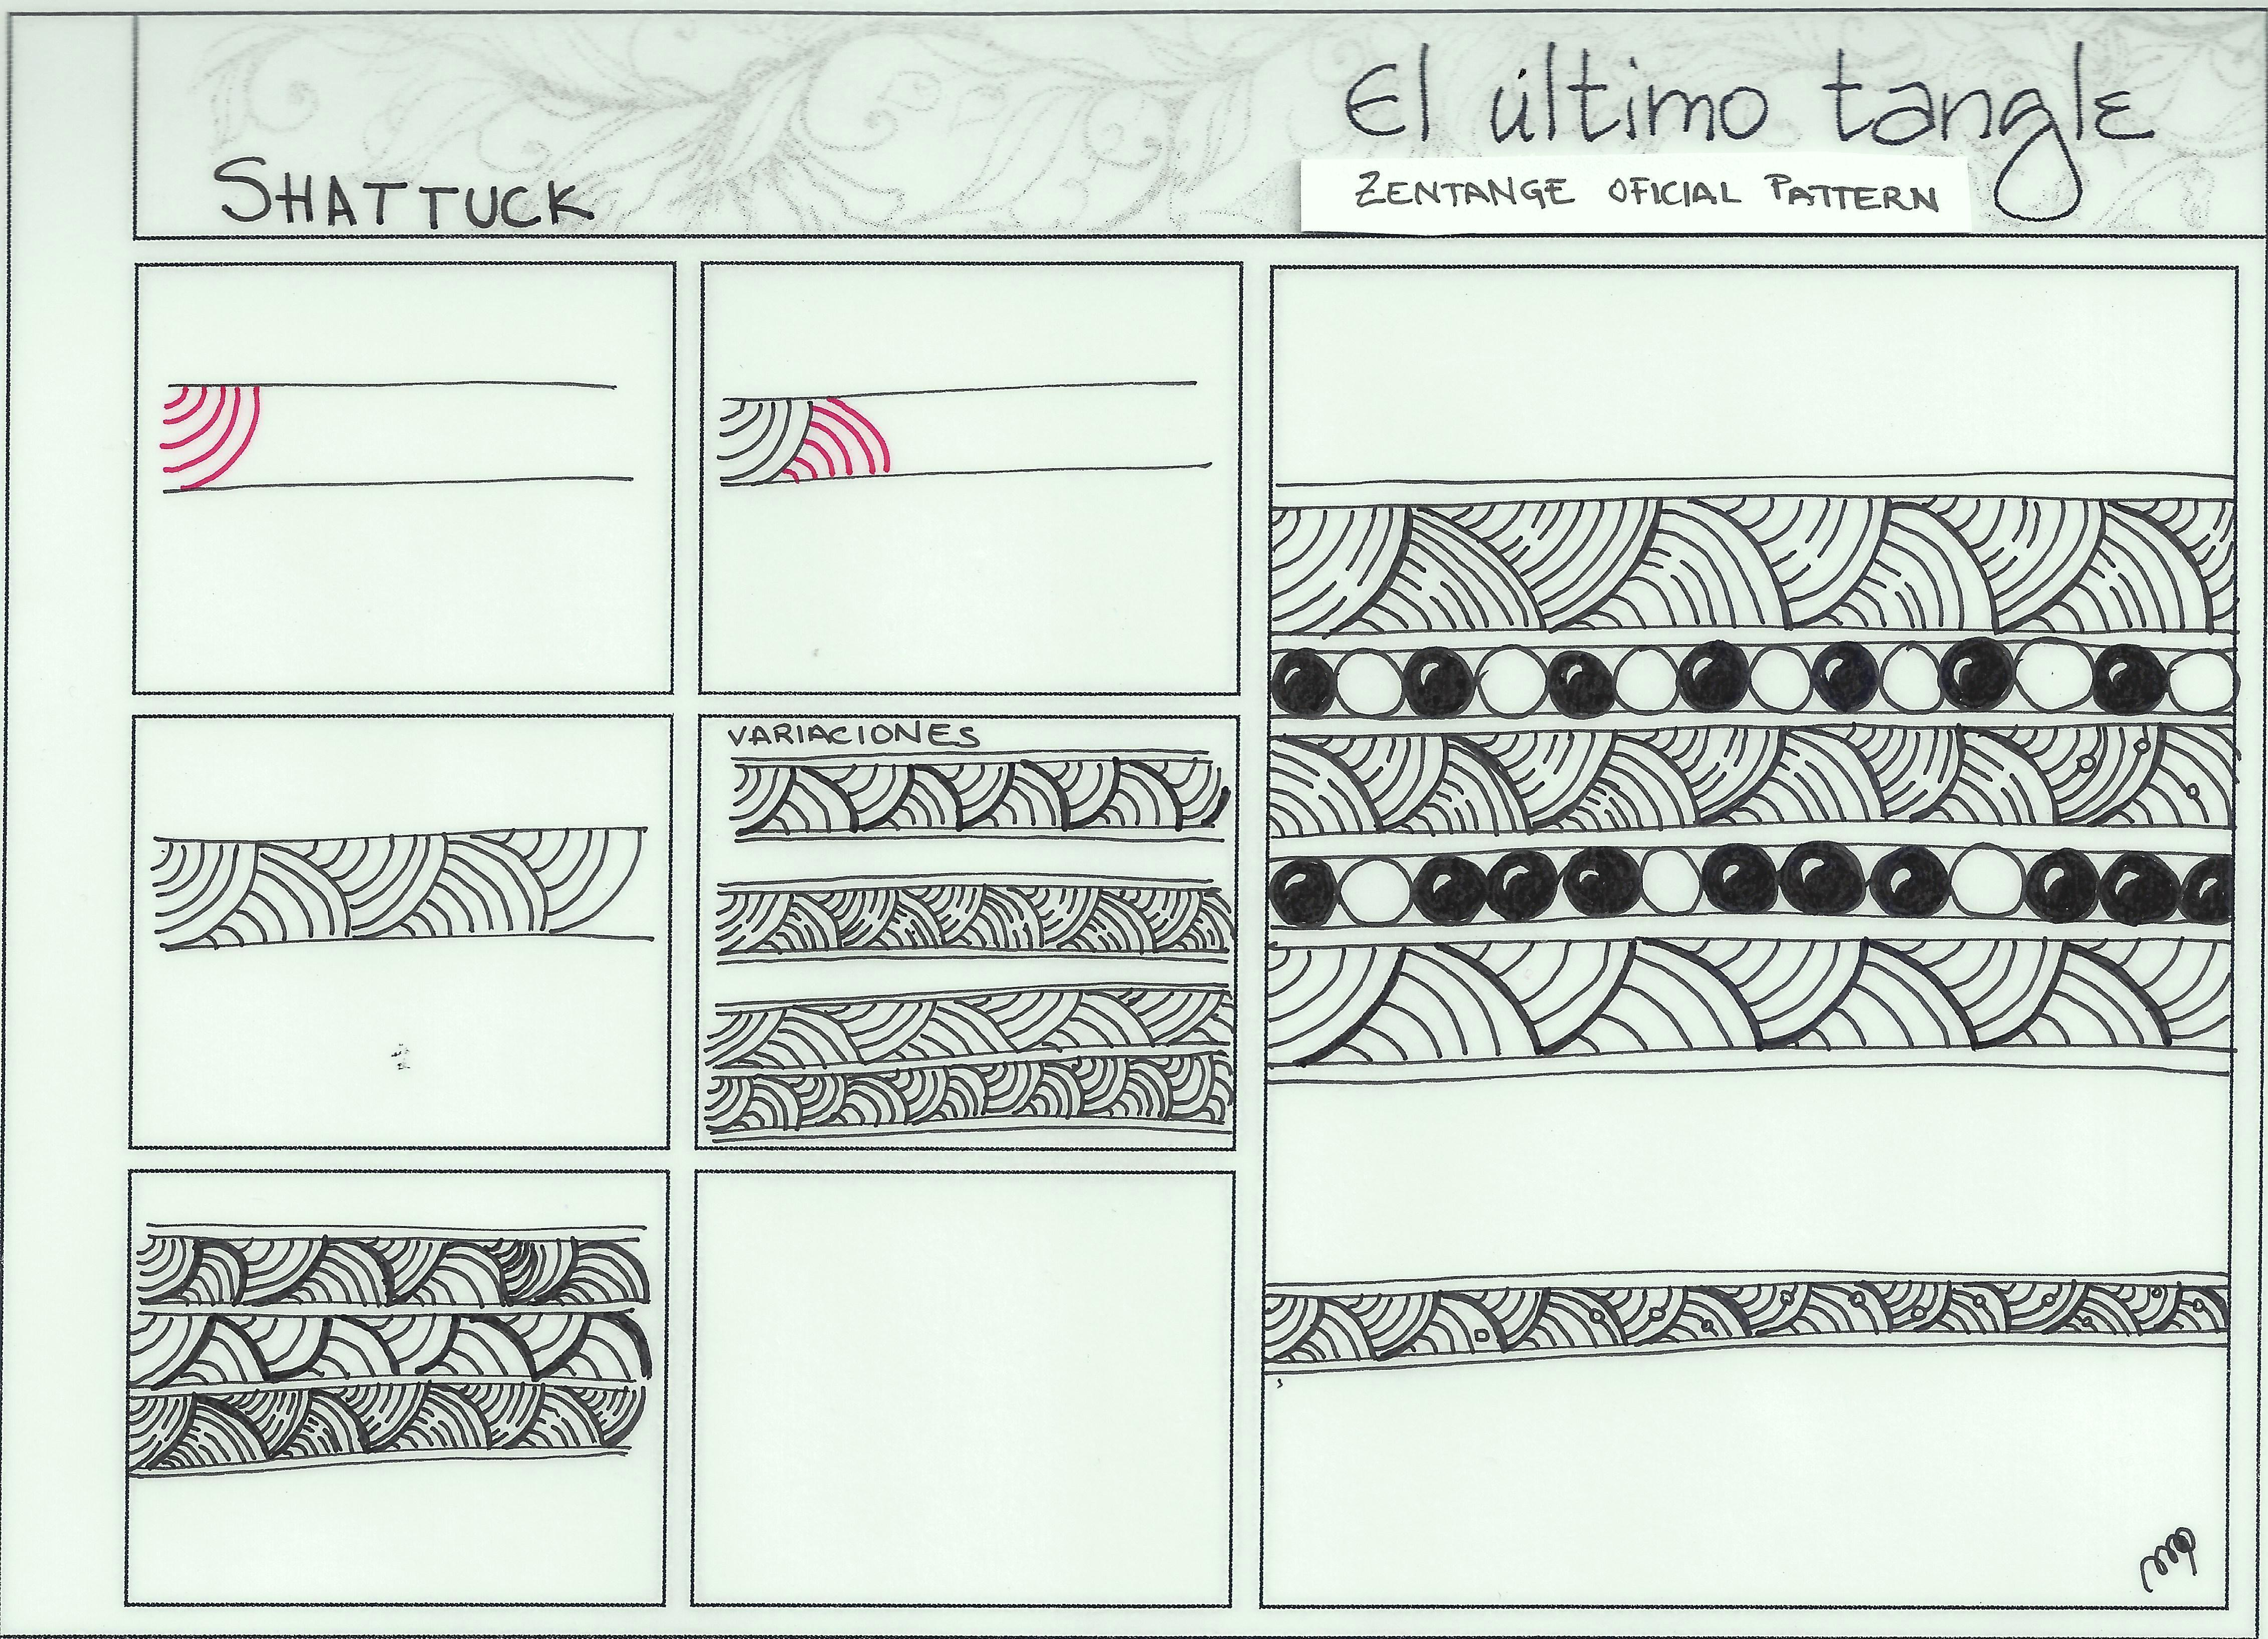 El Ultimo Tangle El Ultimo Tangle Pagina 3 De 4 Zentangle En Espanol